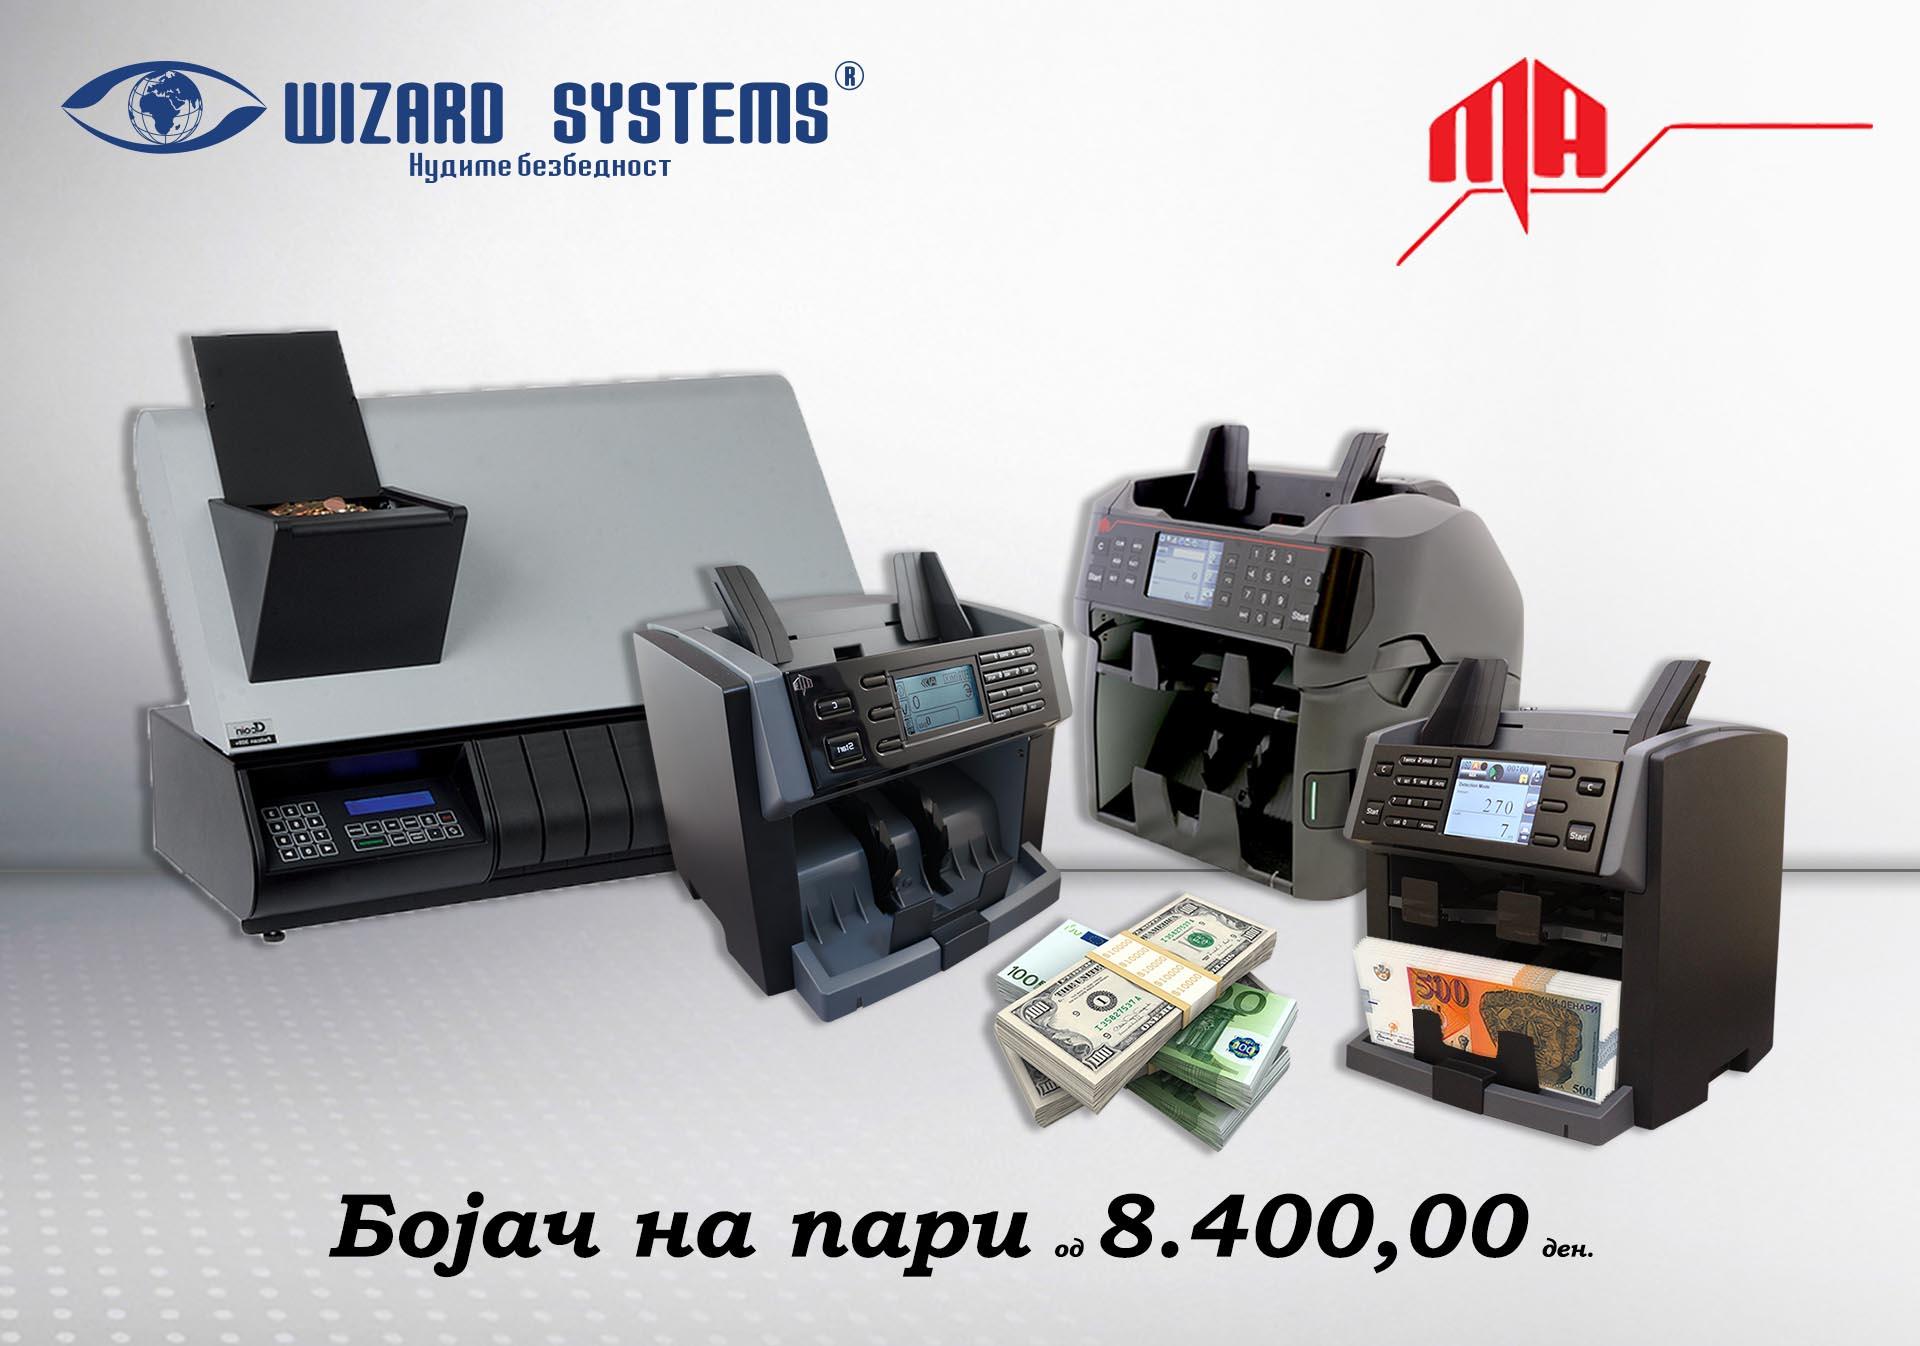 4. Bankarska oprema